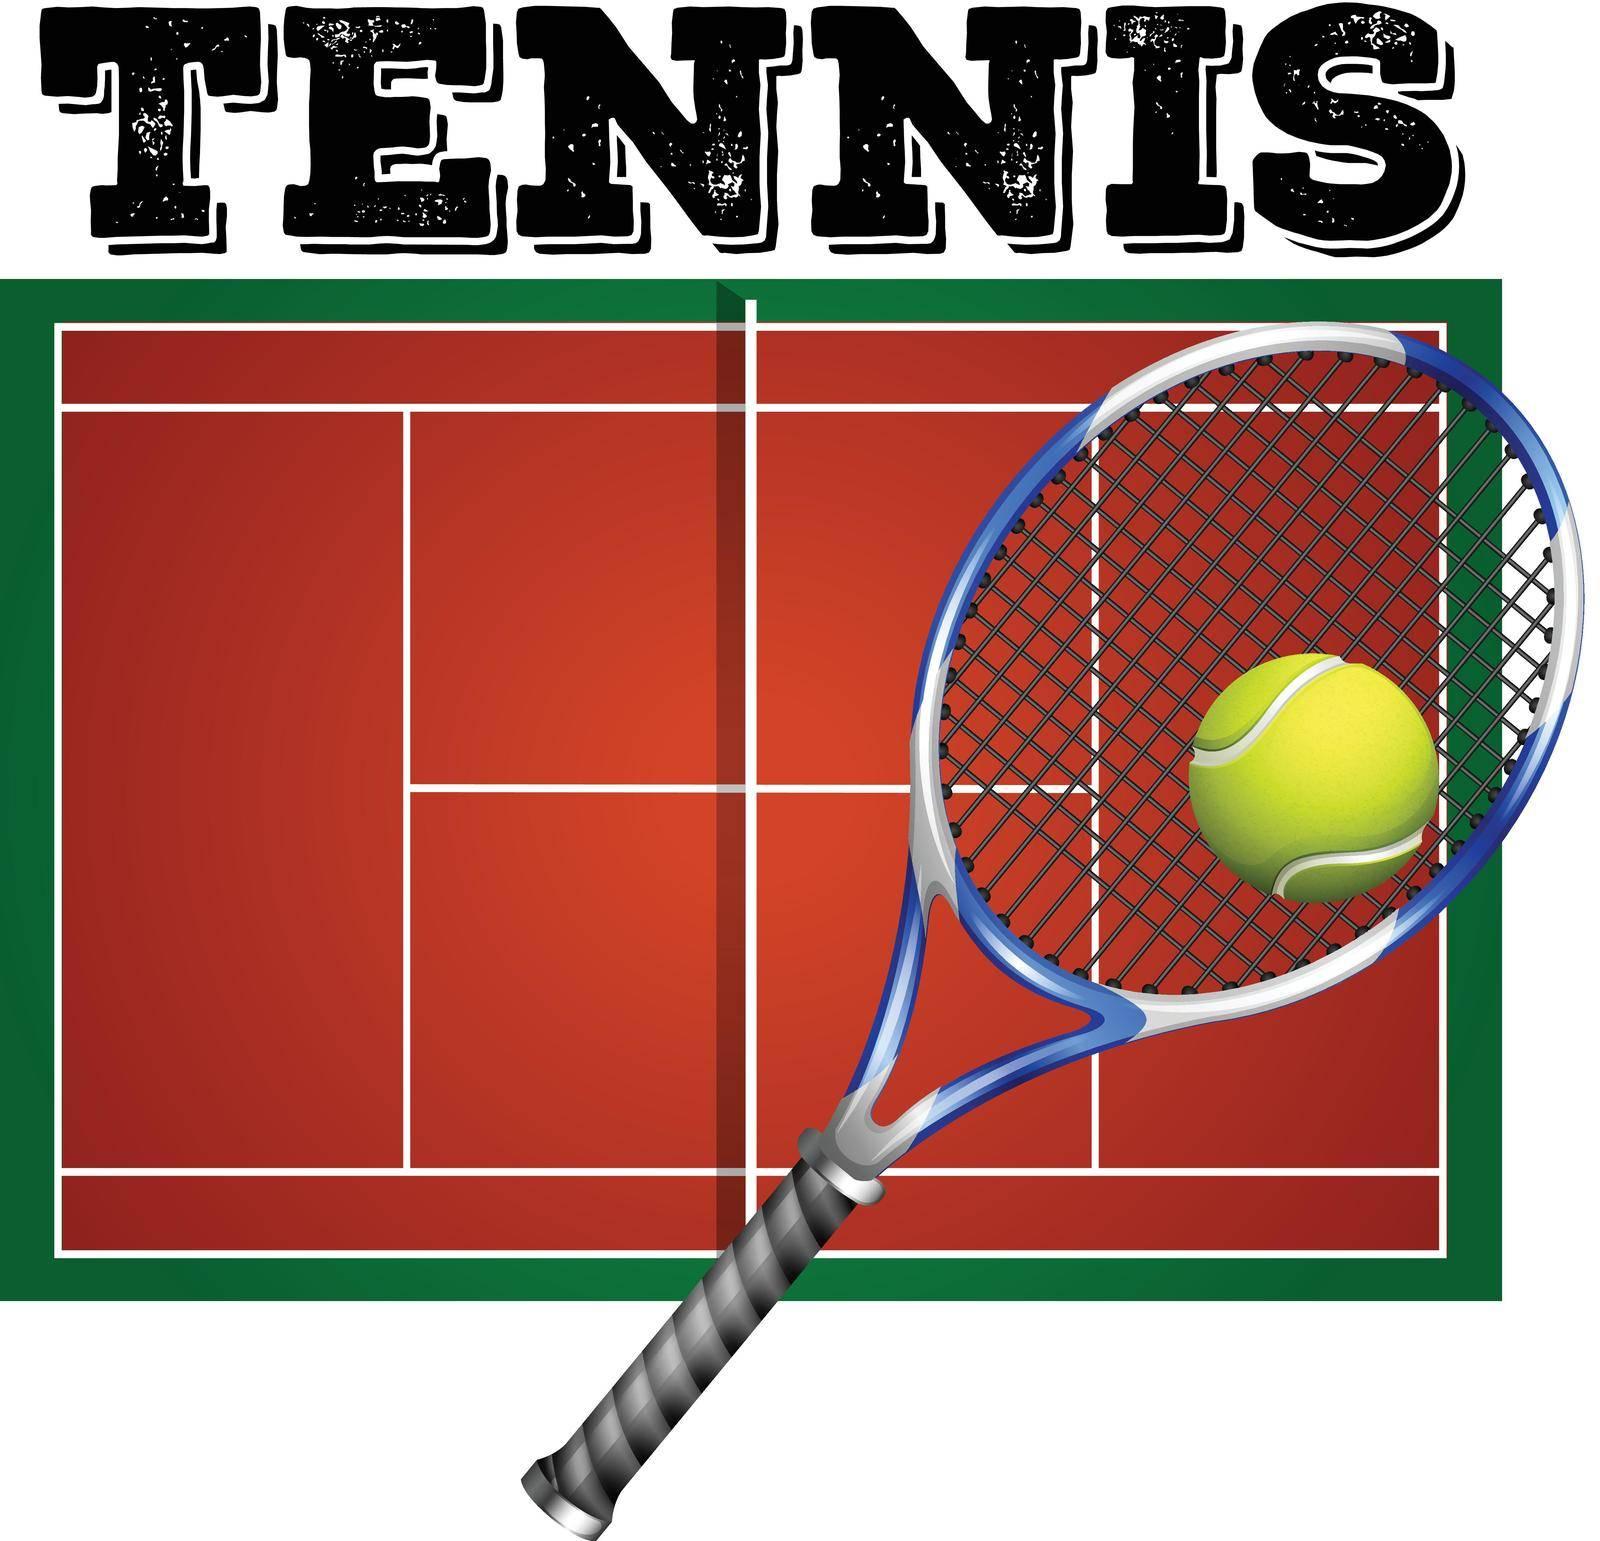 Tennis court and equipment illustration